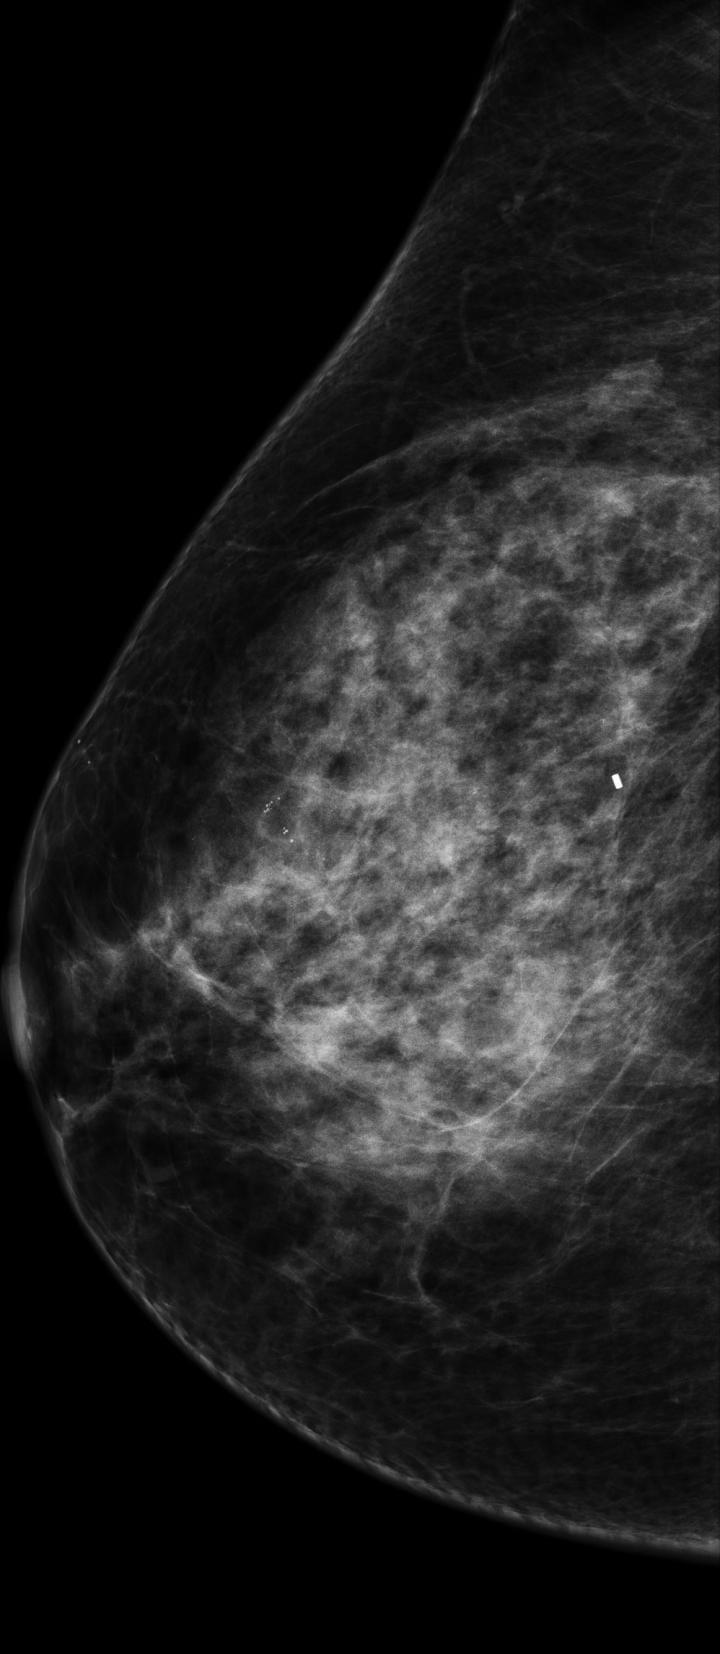 This mammogram depicts breast bearing malignant tumor. CREDIT Houston Methodist